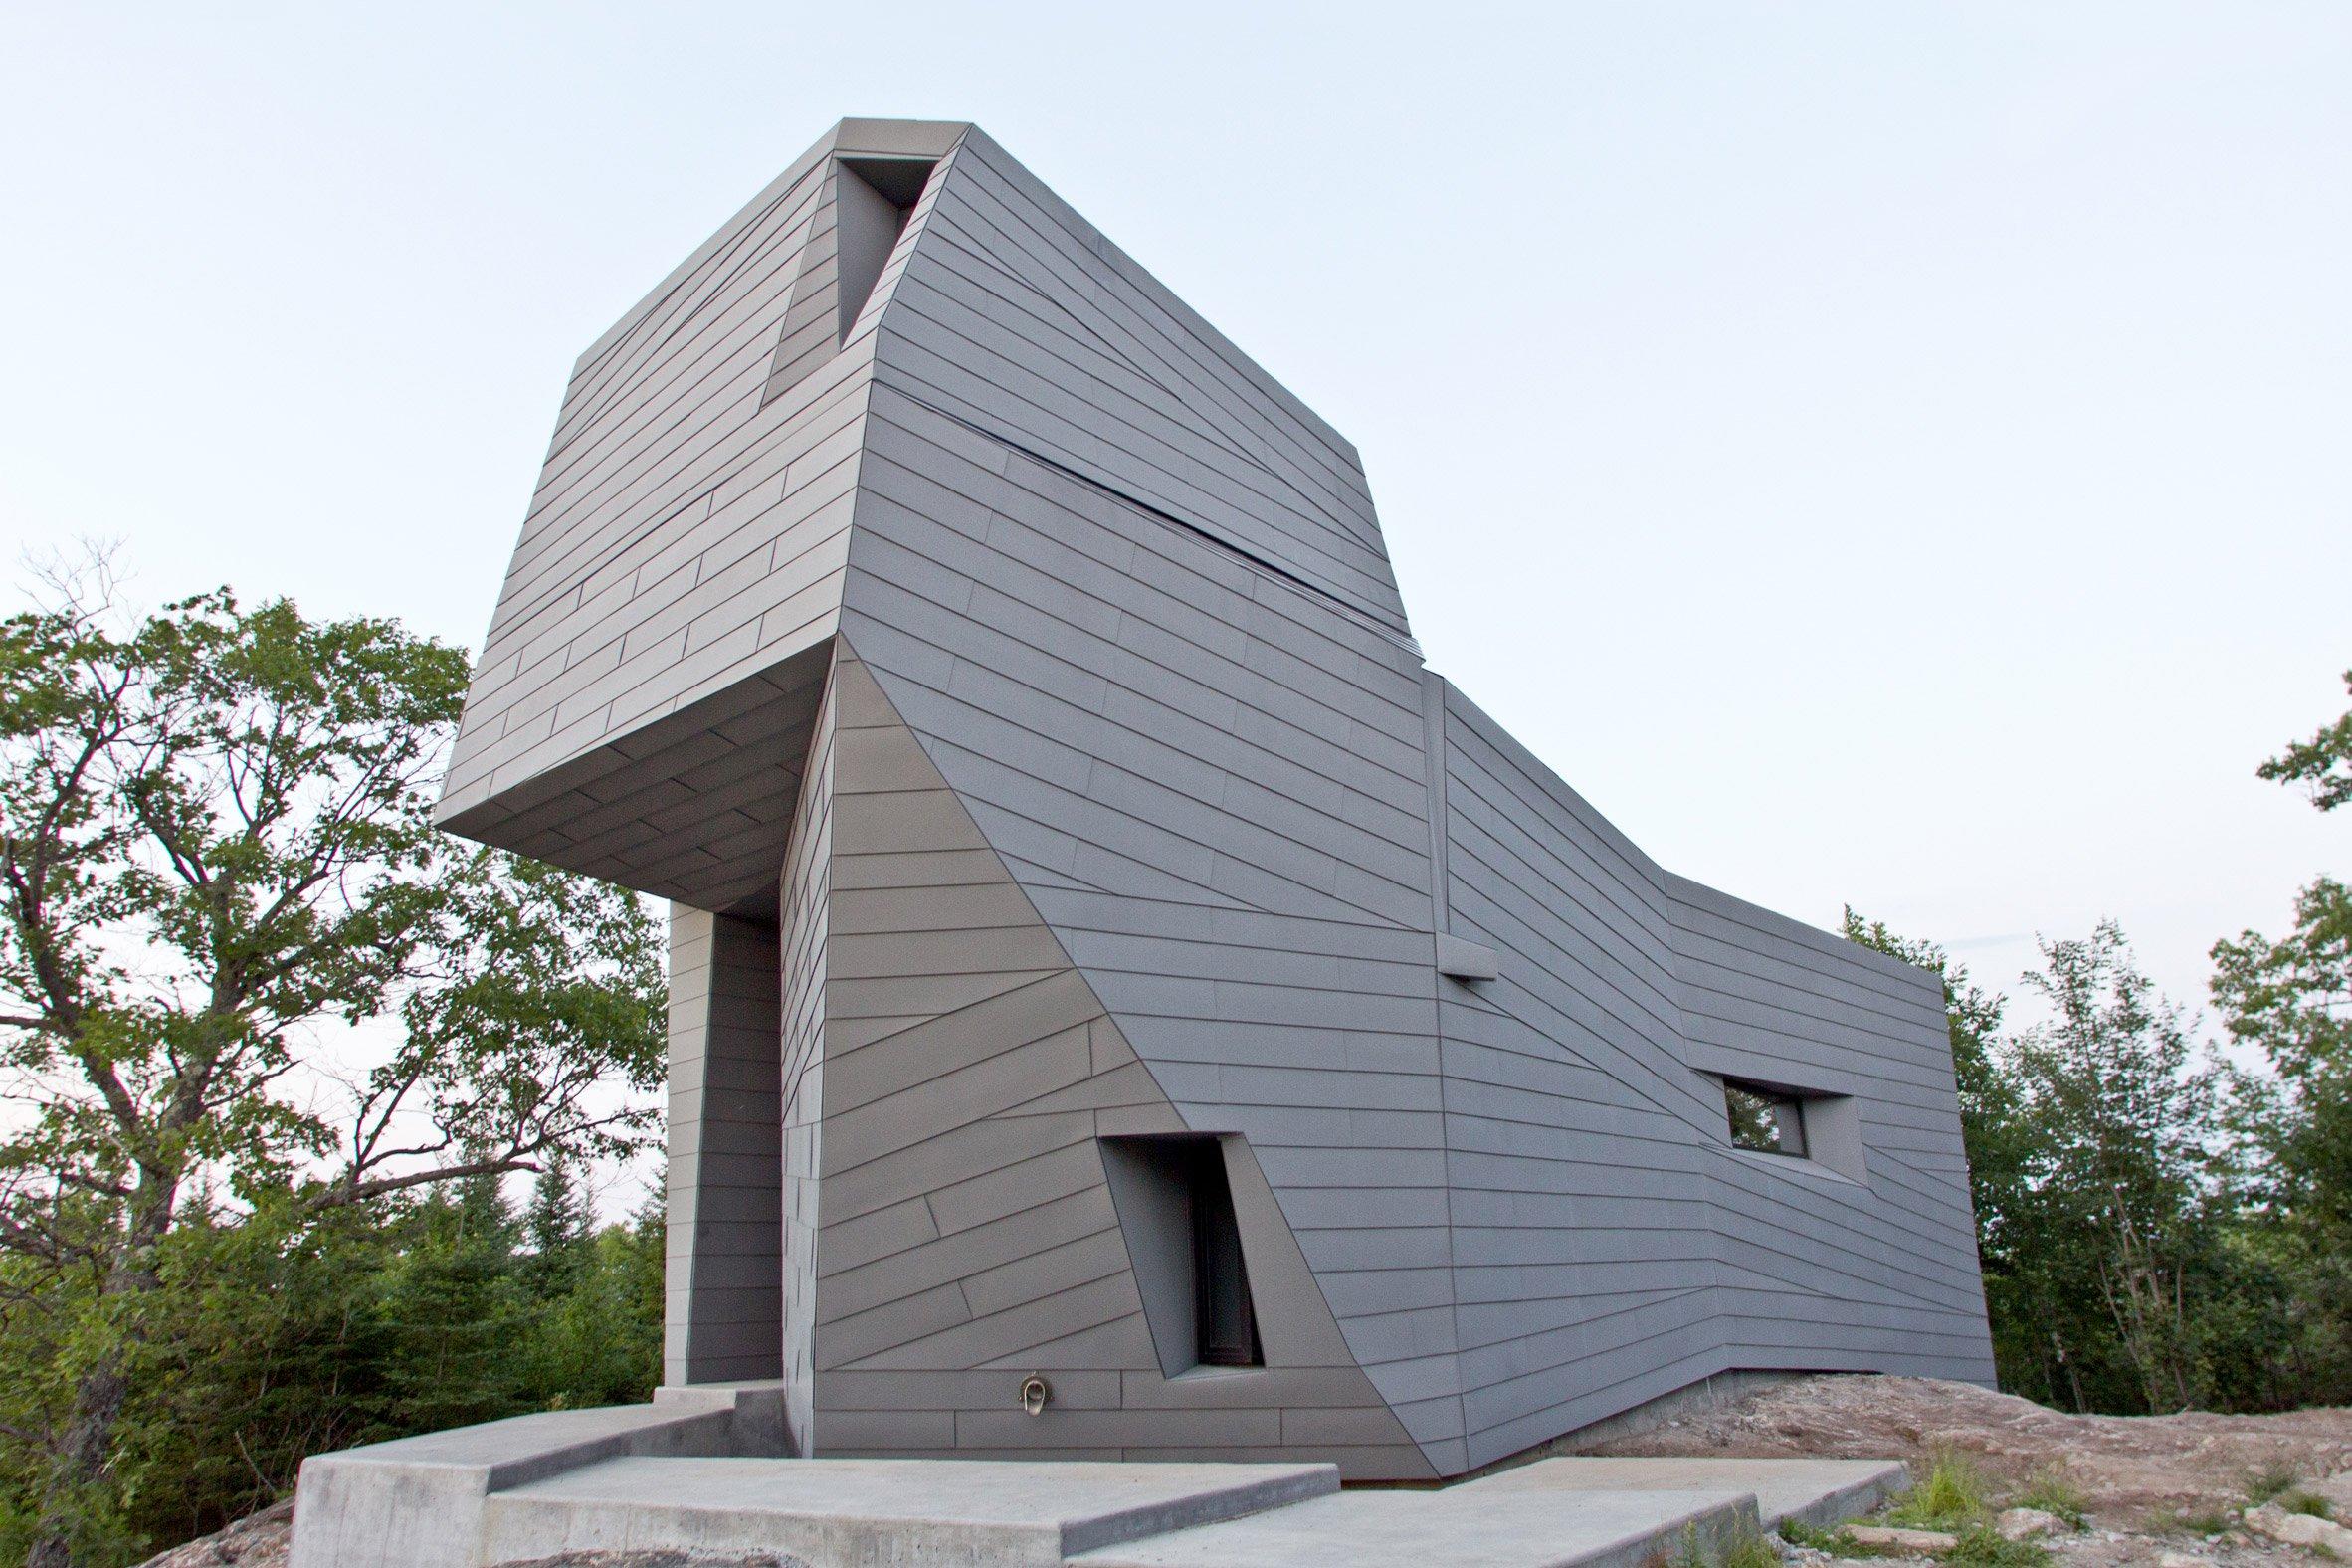 gemma-observatory-anmahian-winton-architects_dezeen_2364_col_2.jpg